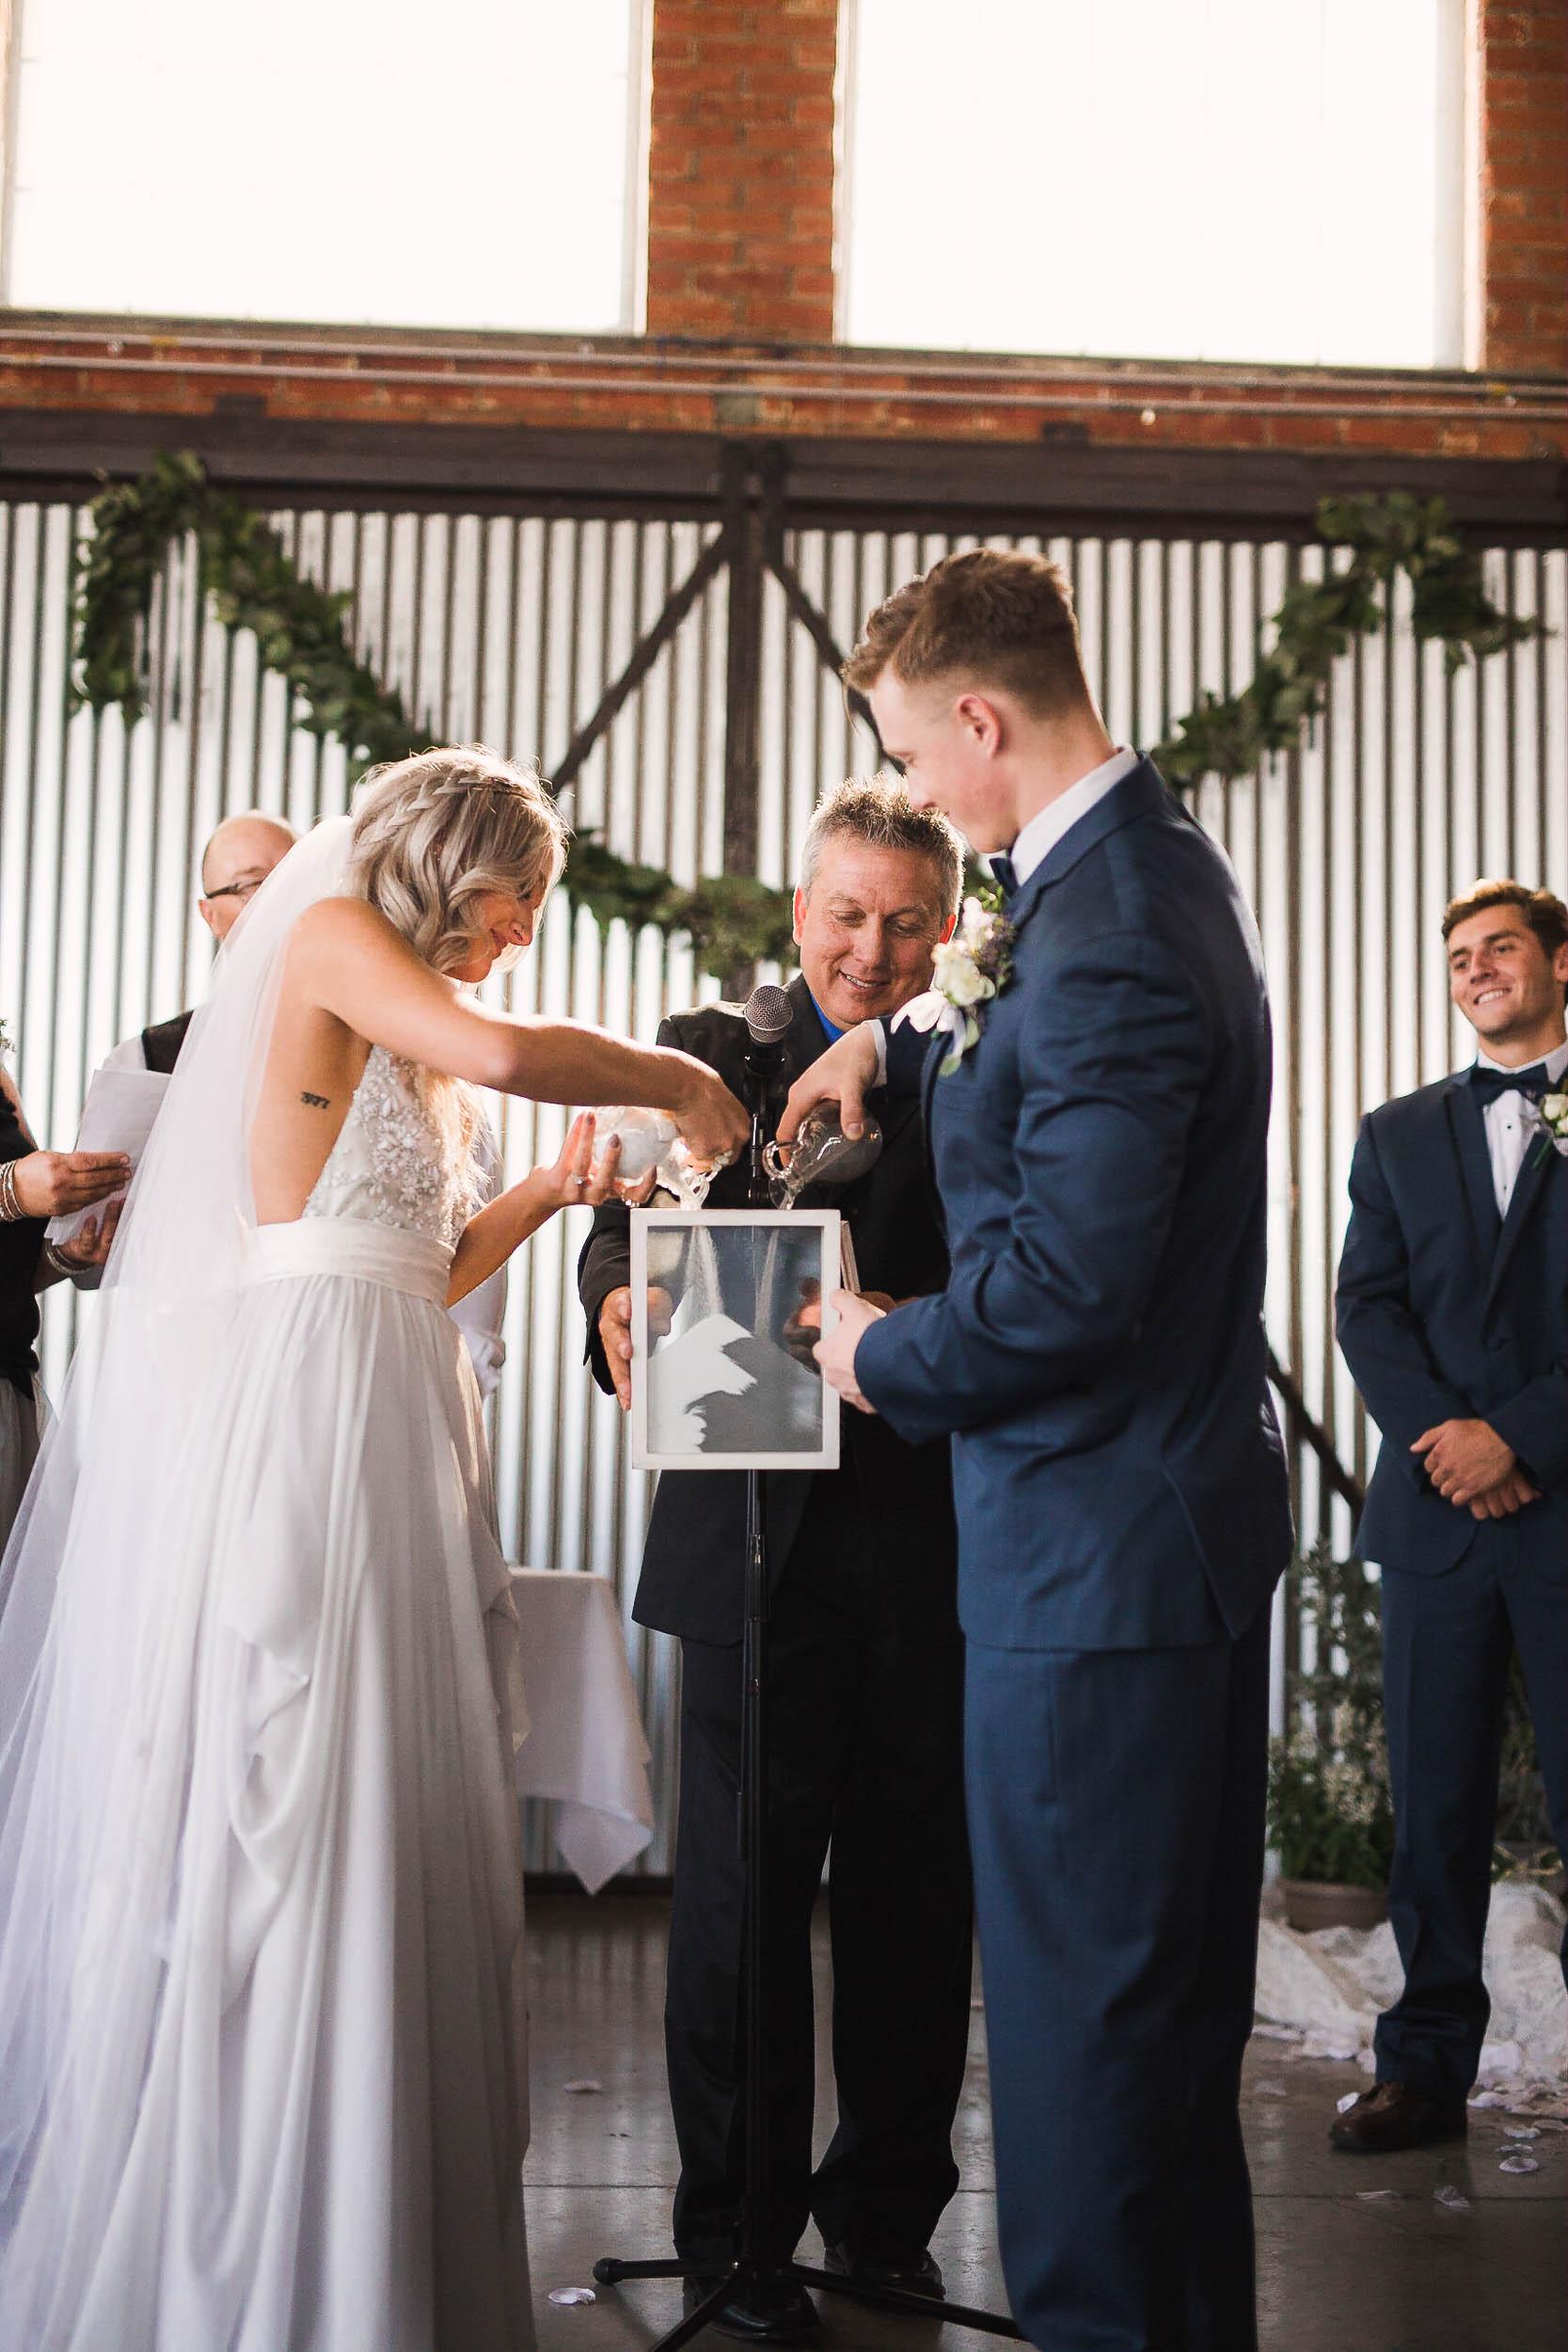 KyleLovesTori-Casper-Wyoming-Wedding-94.jpg